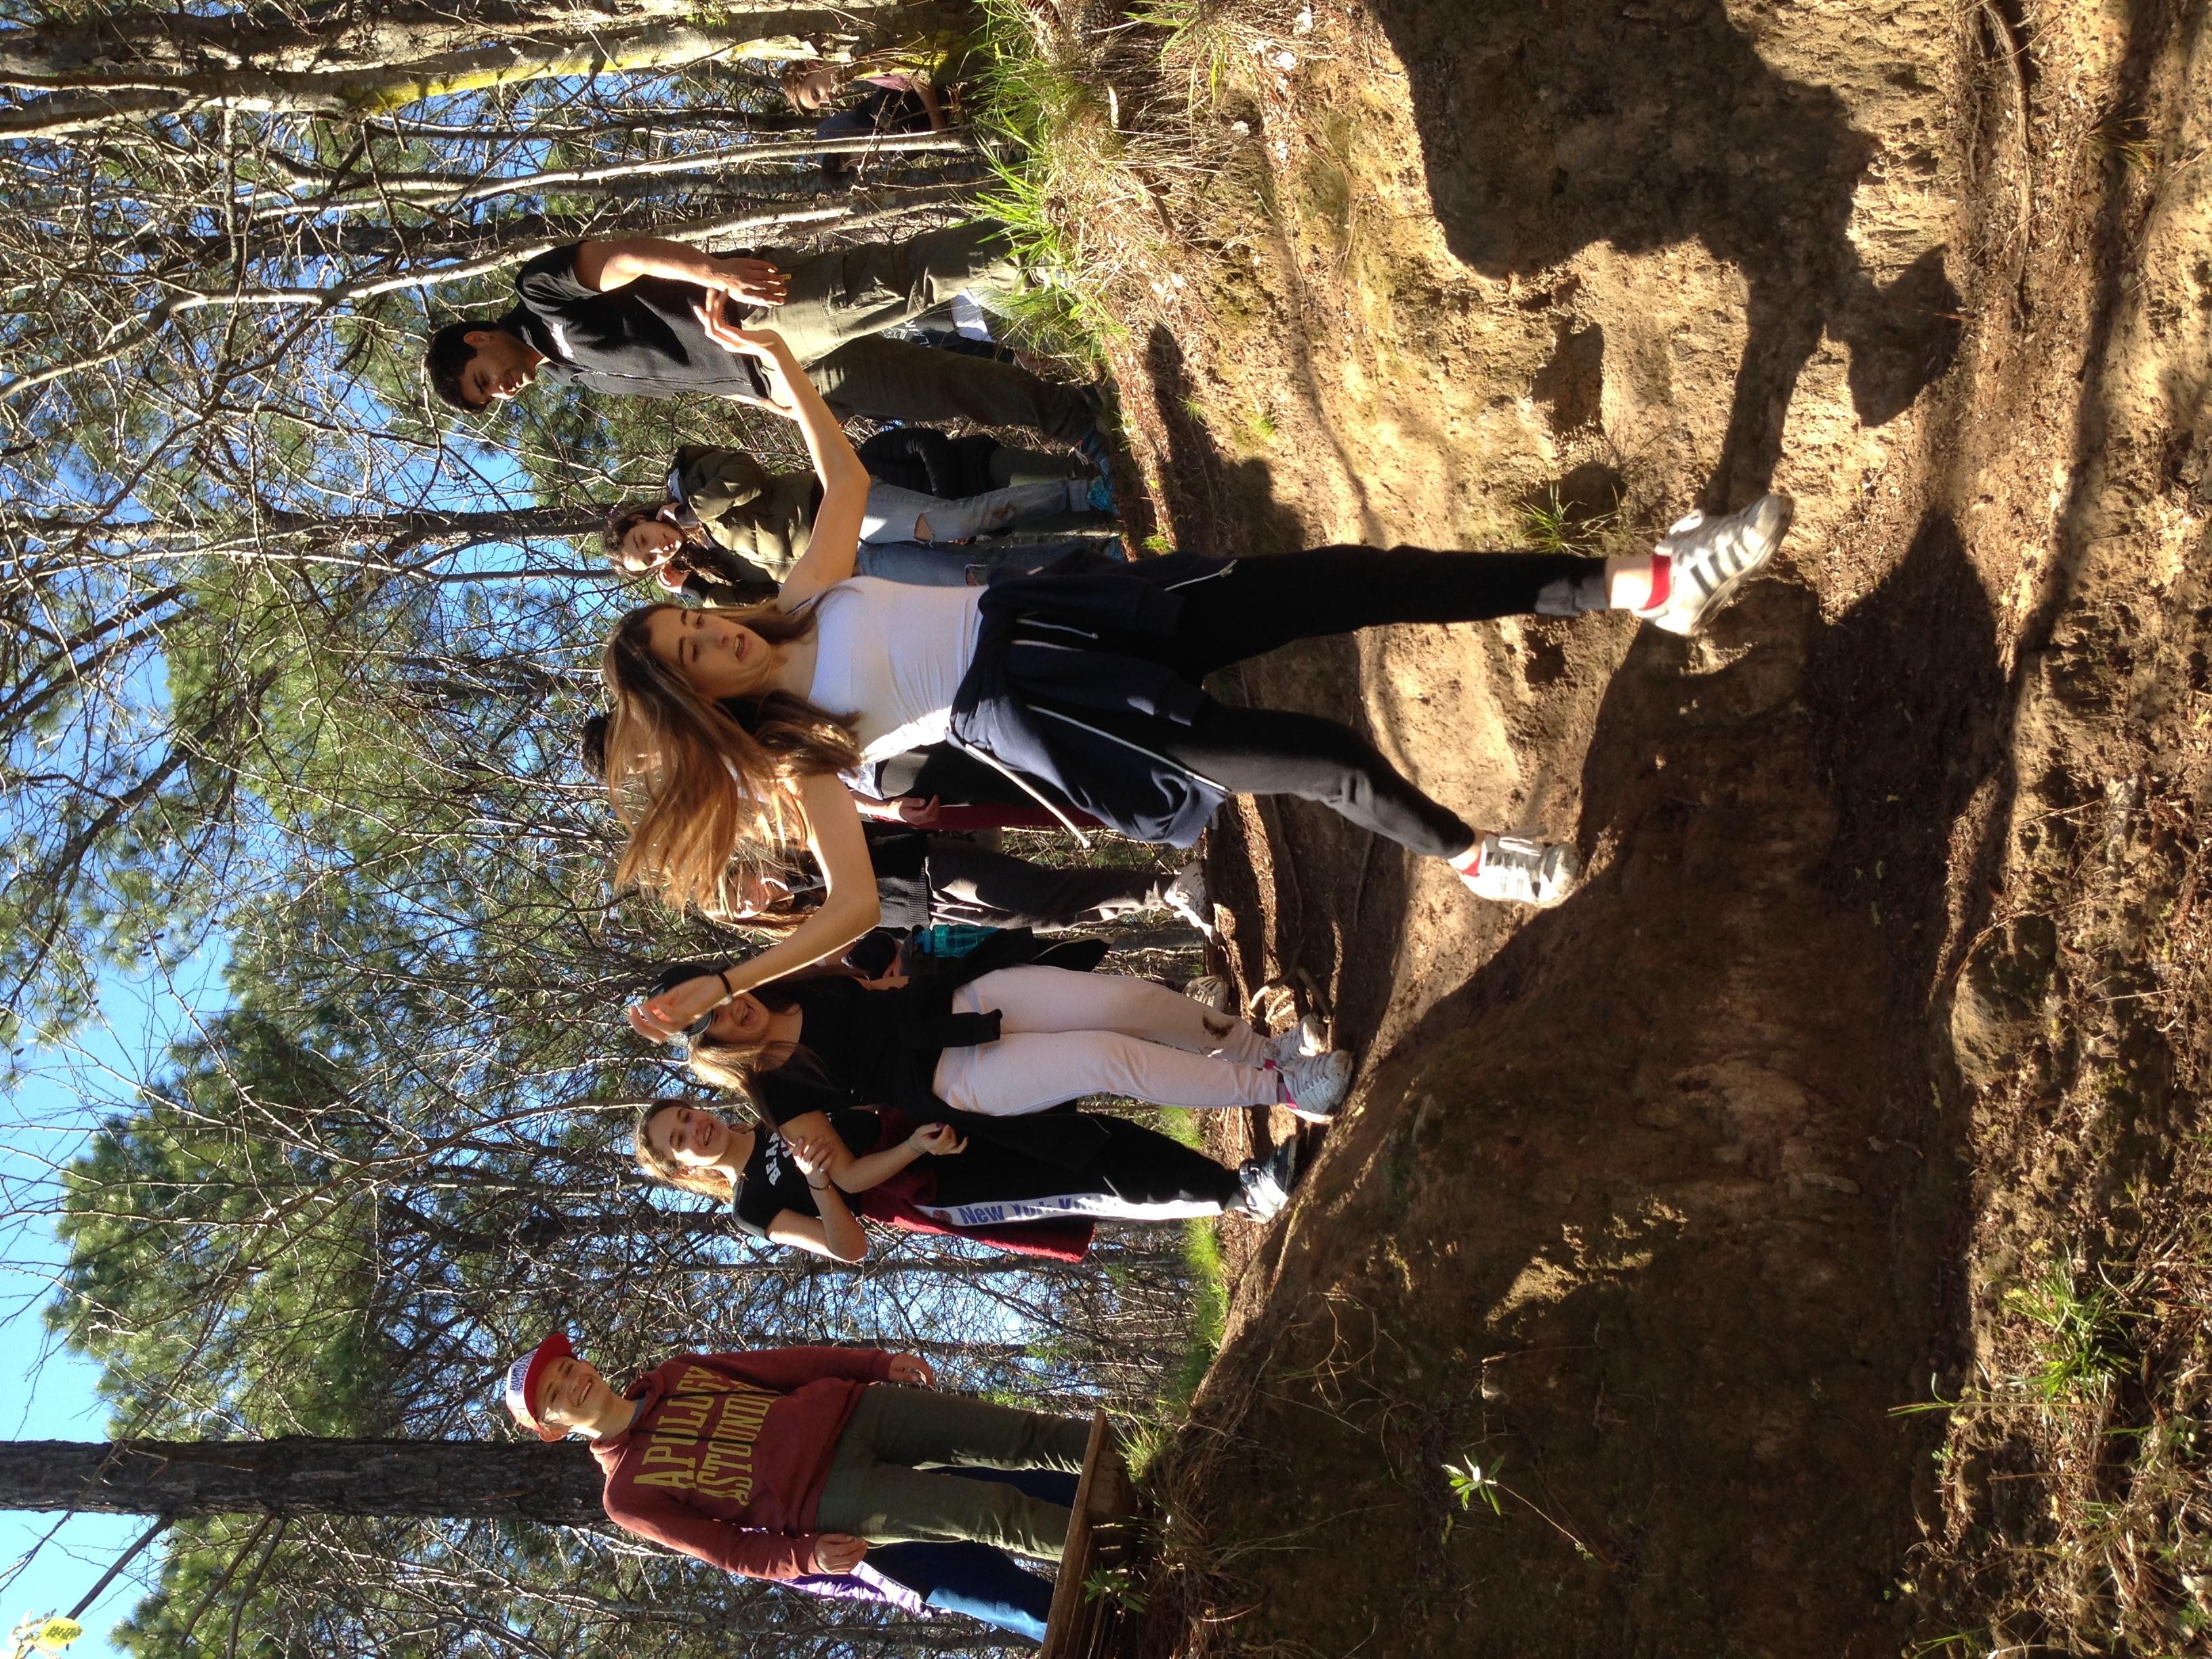 Caminata o trekking de aventura